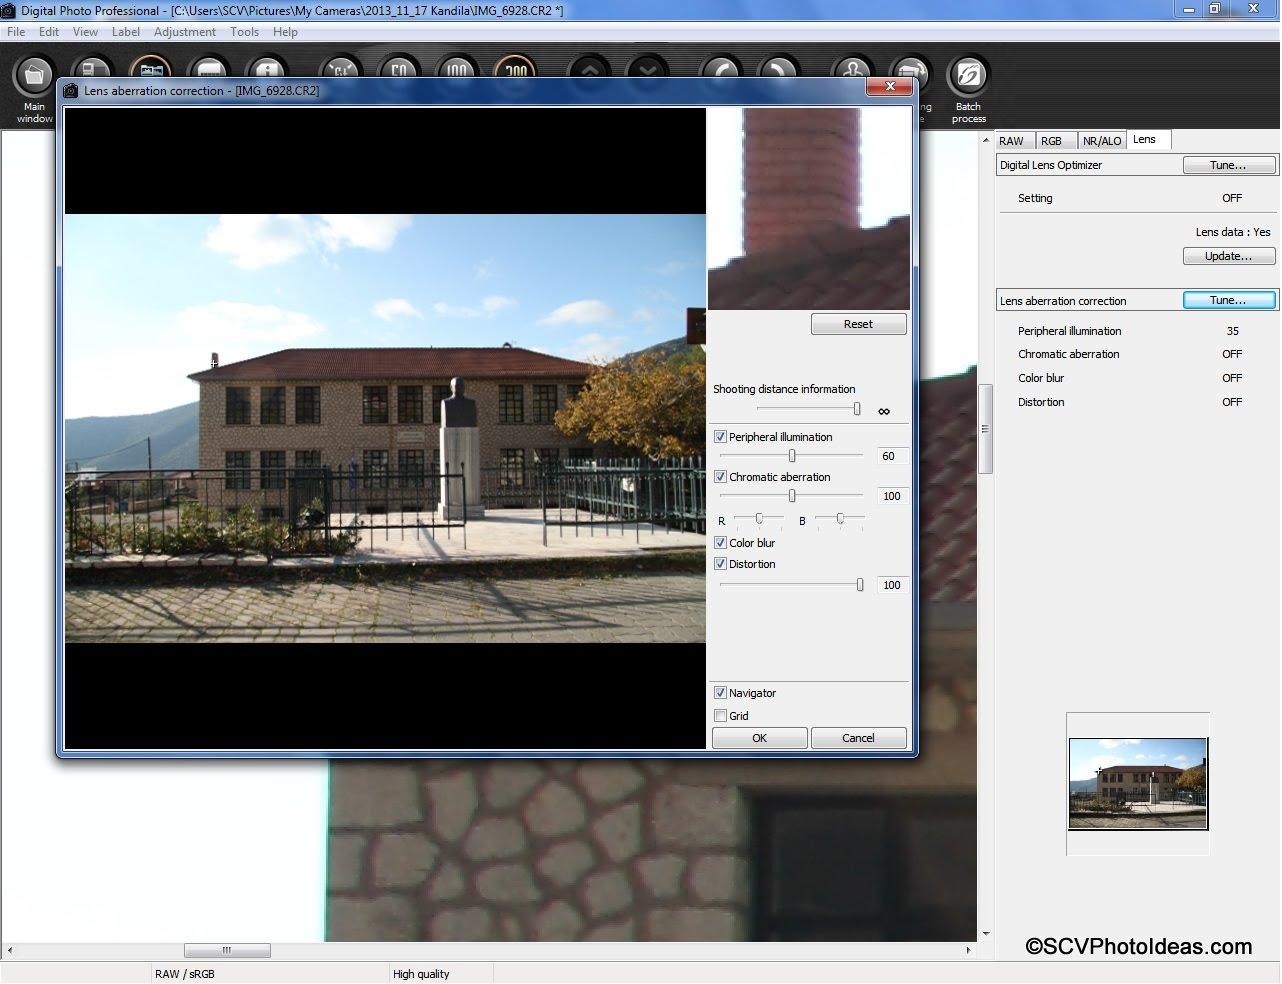 Canon EF-S 17-85 mm Chromatic Aberration processing in Canon Digital Photo Pro